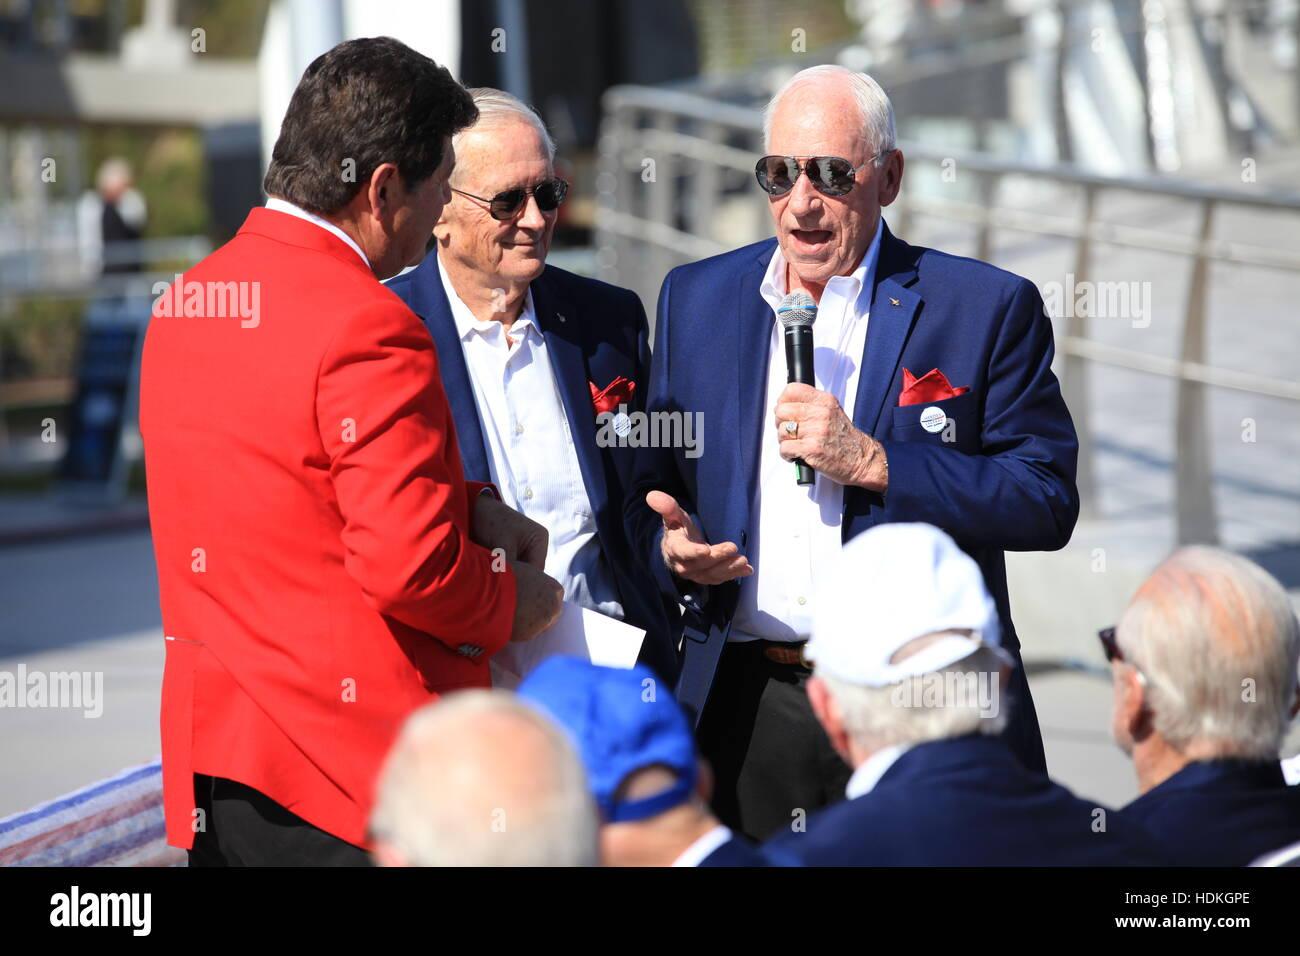 Former CNN correspondent John Zarella (left) interviews NASA Apollo astronauts Charlie Duke (middle) and Walt Cunningham - Stock Image